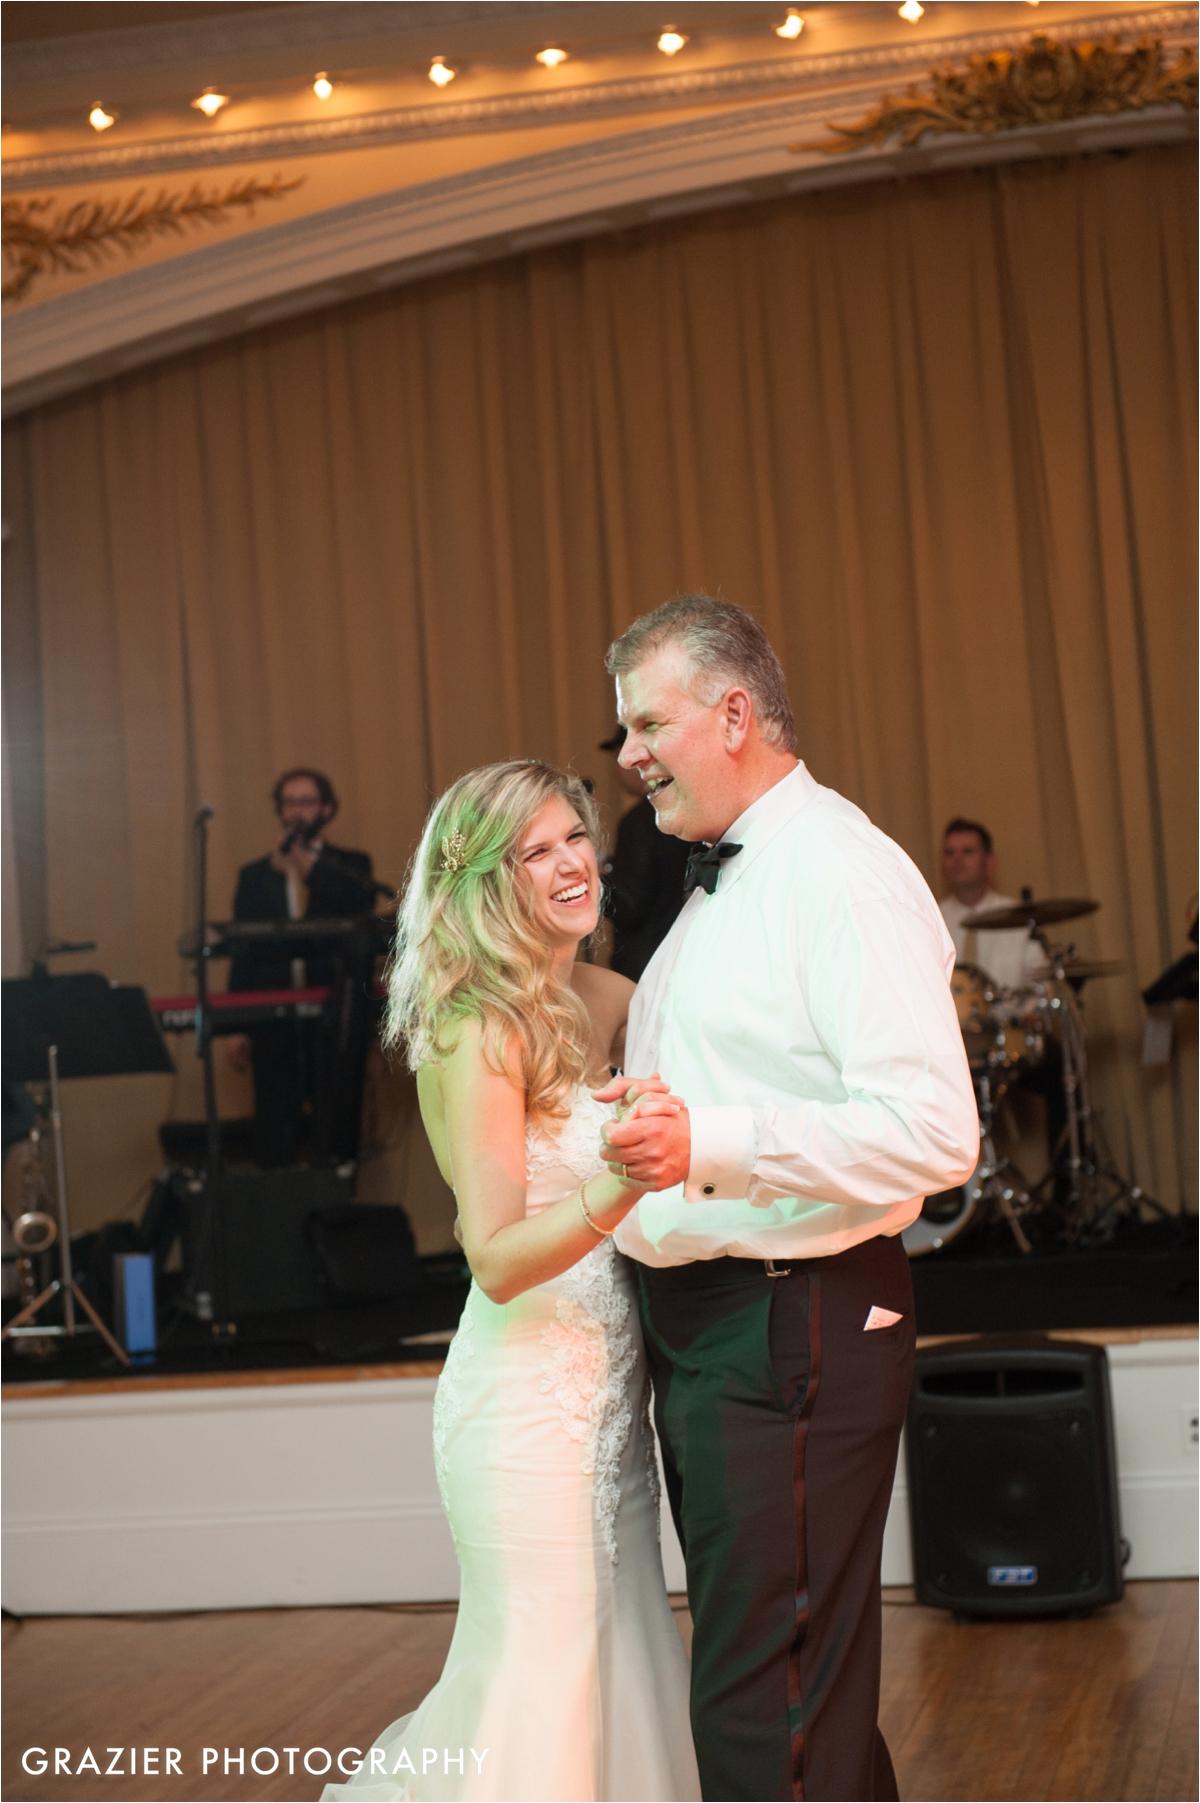 Mount-Washington-Hotel-Wedding-Grazier-Photography_0048.jpg